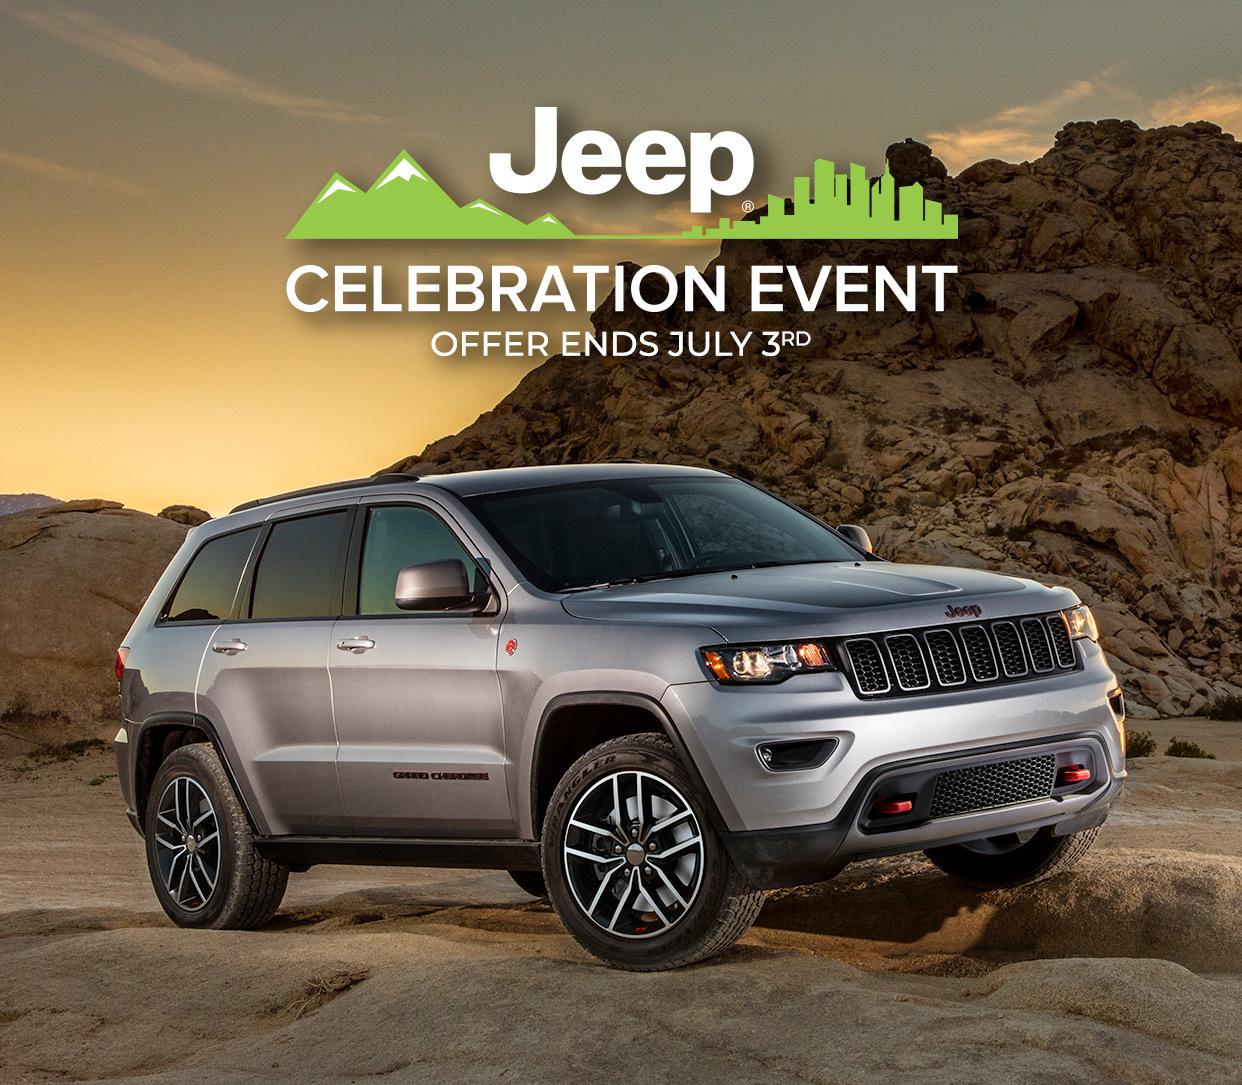 chrysler of s brands dodge james cars jeep tweedcjd at frizelle sale our awarded star one dealerships for search